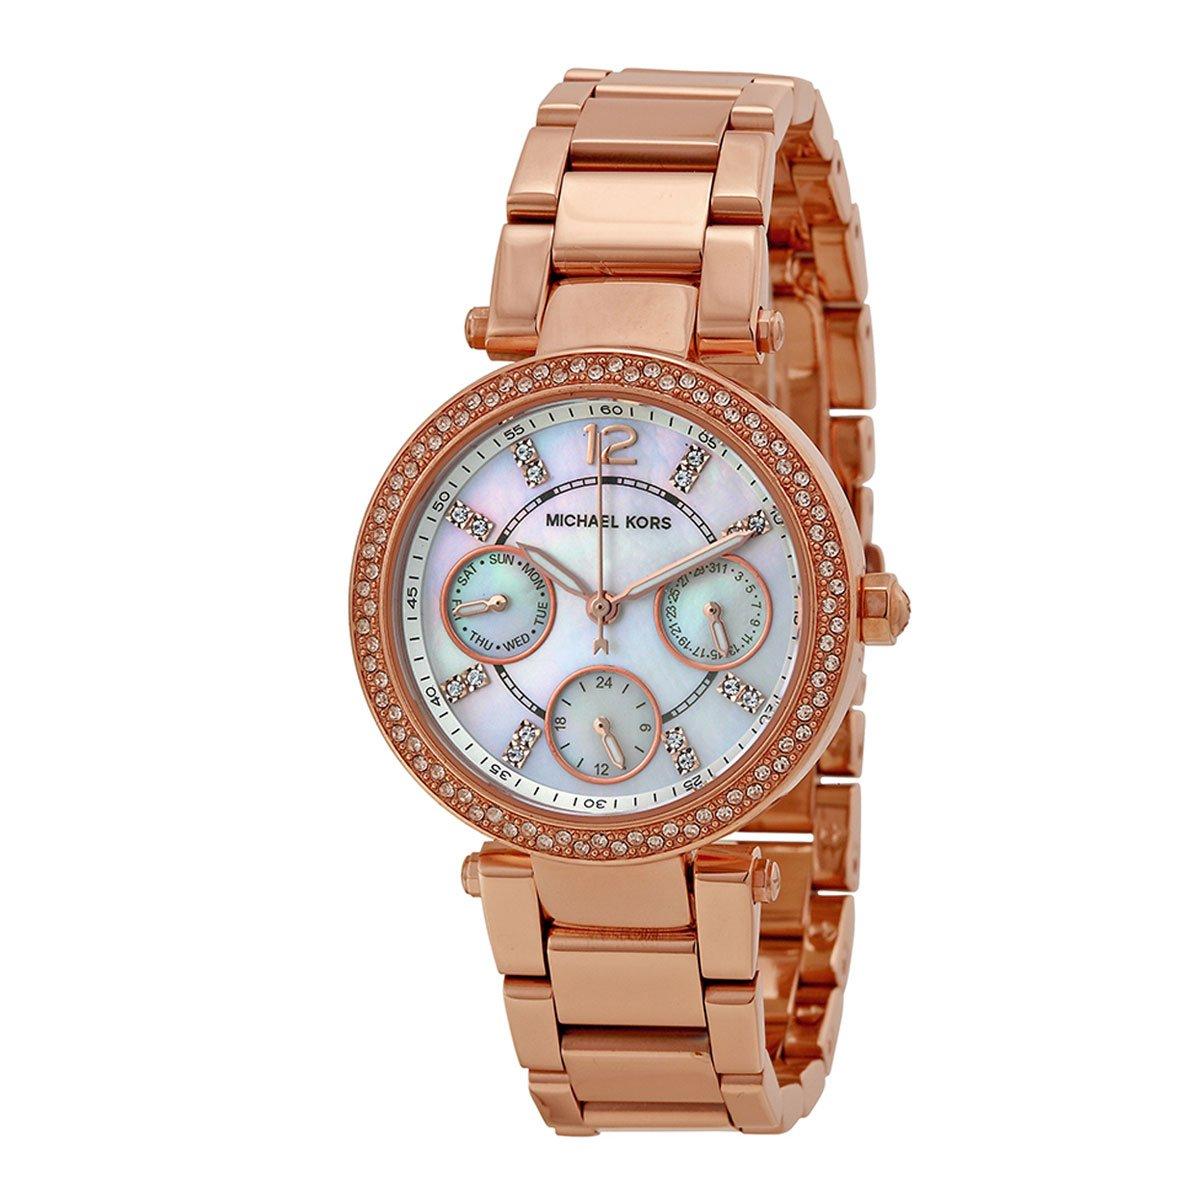 Michael Kors Watches Parker Watch (Rose Gold Metal)